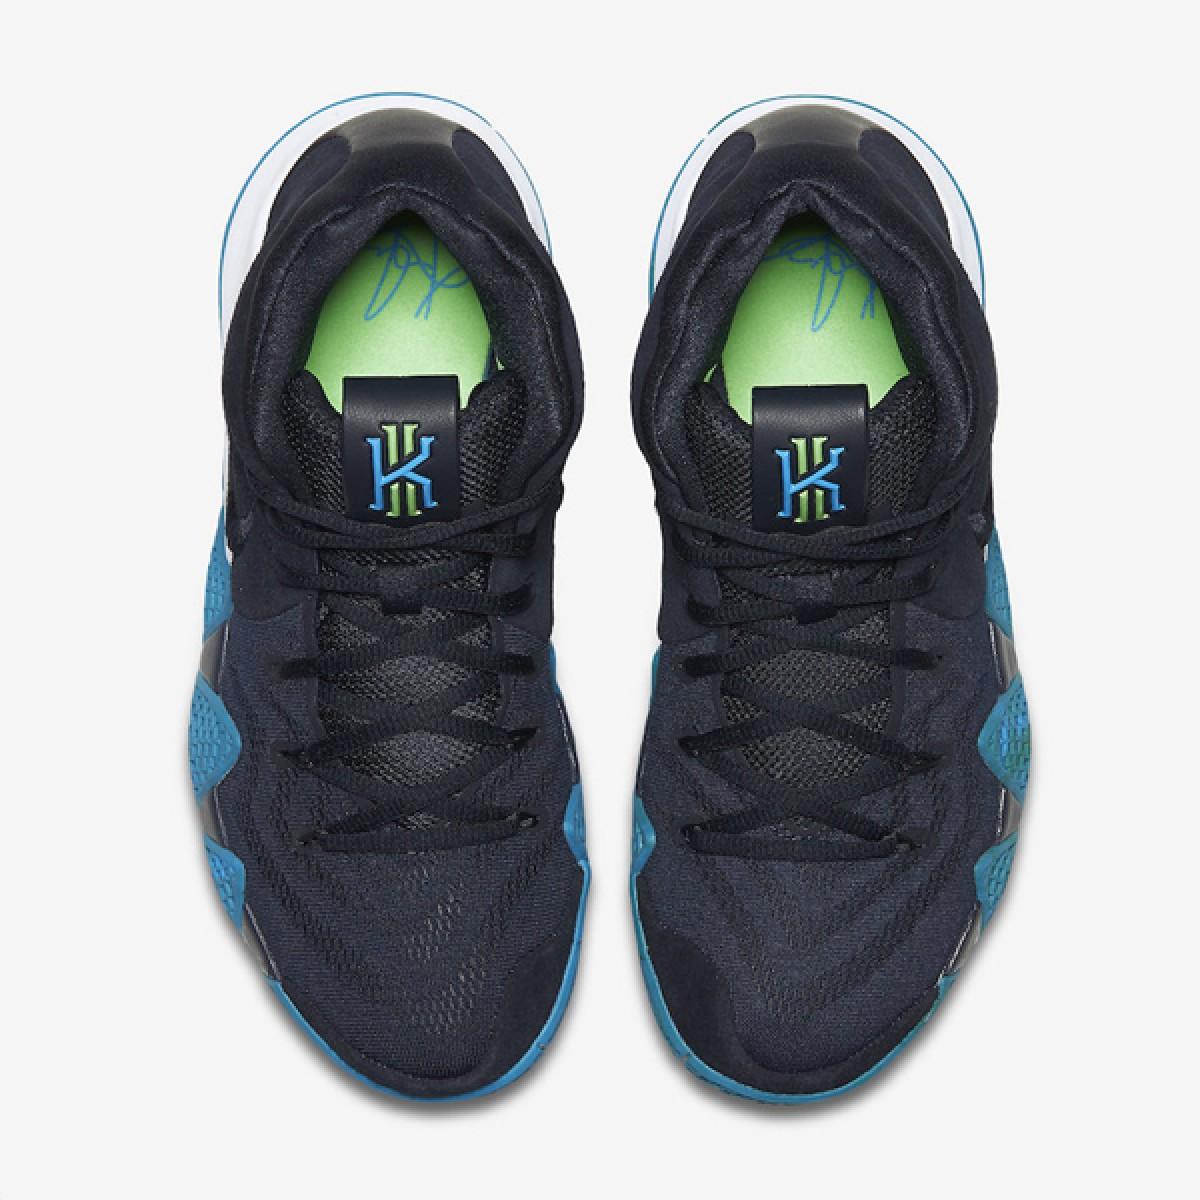 Nike Kyrie 4 'Obsidian' 943806-401